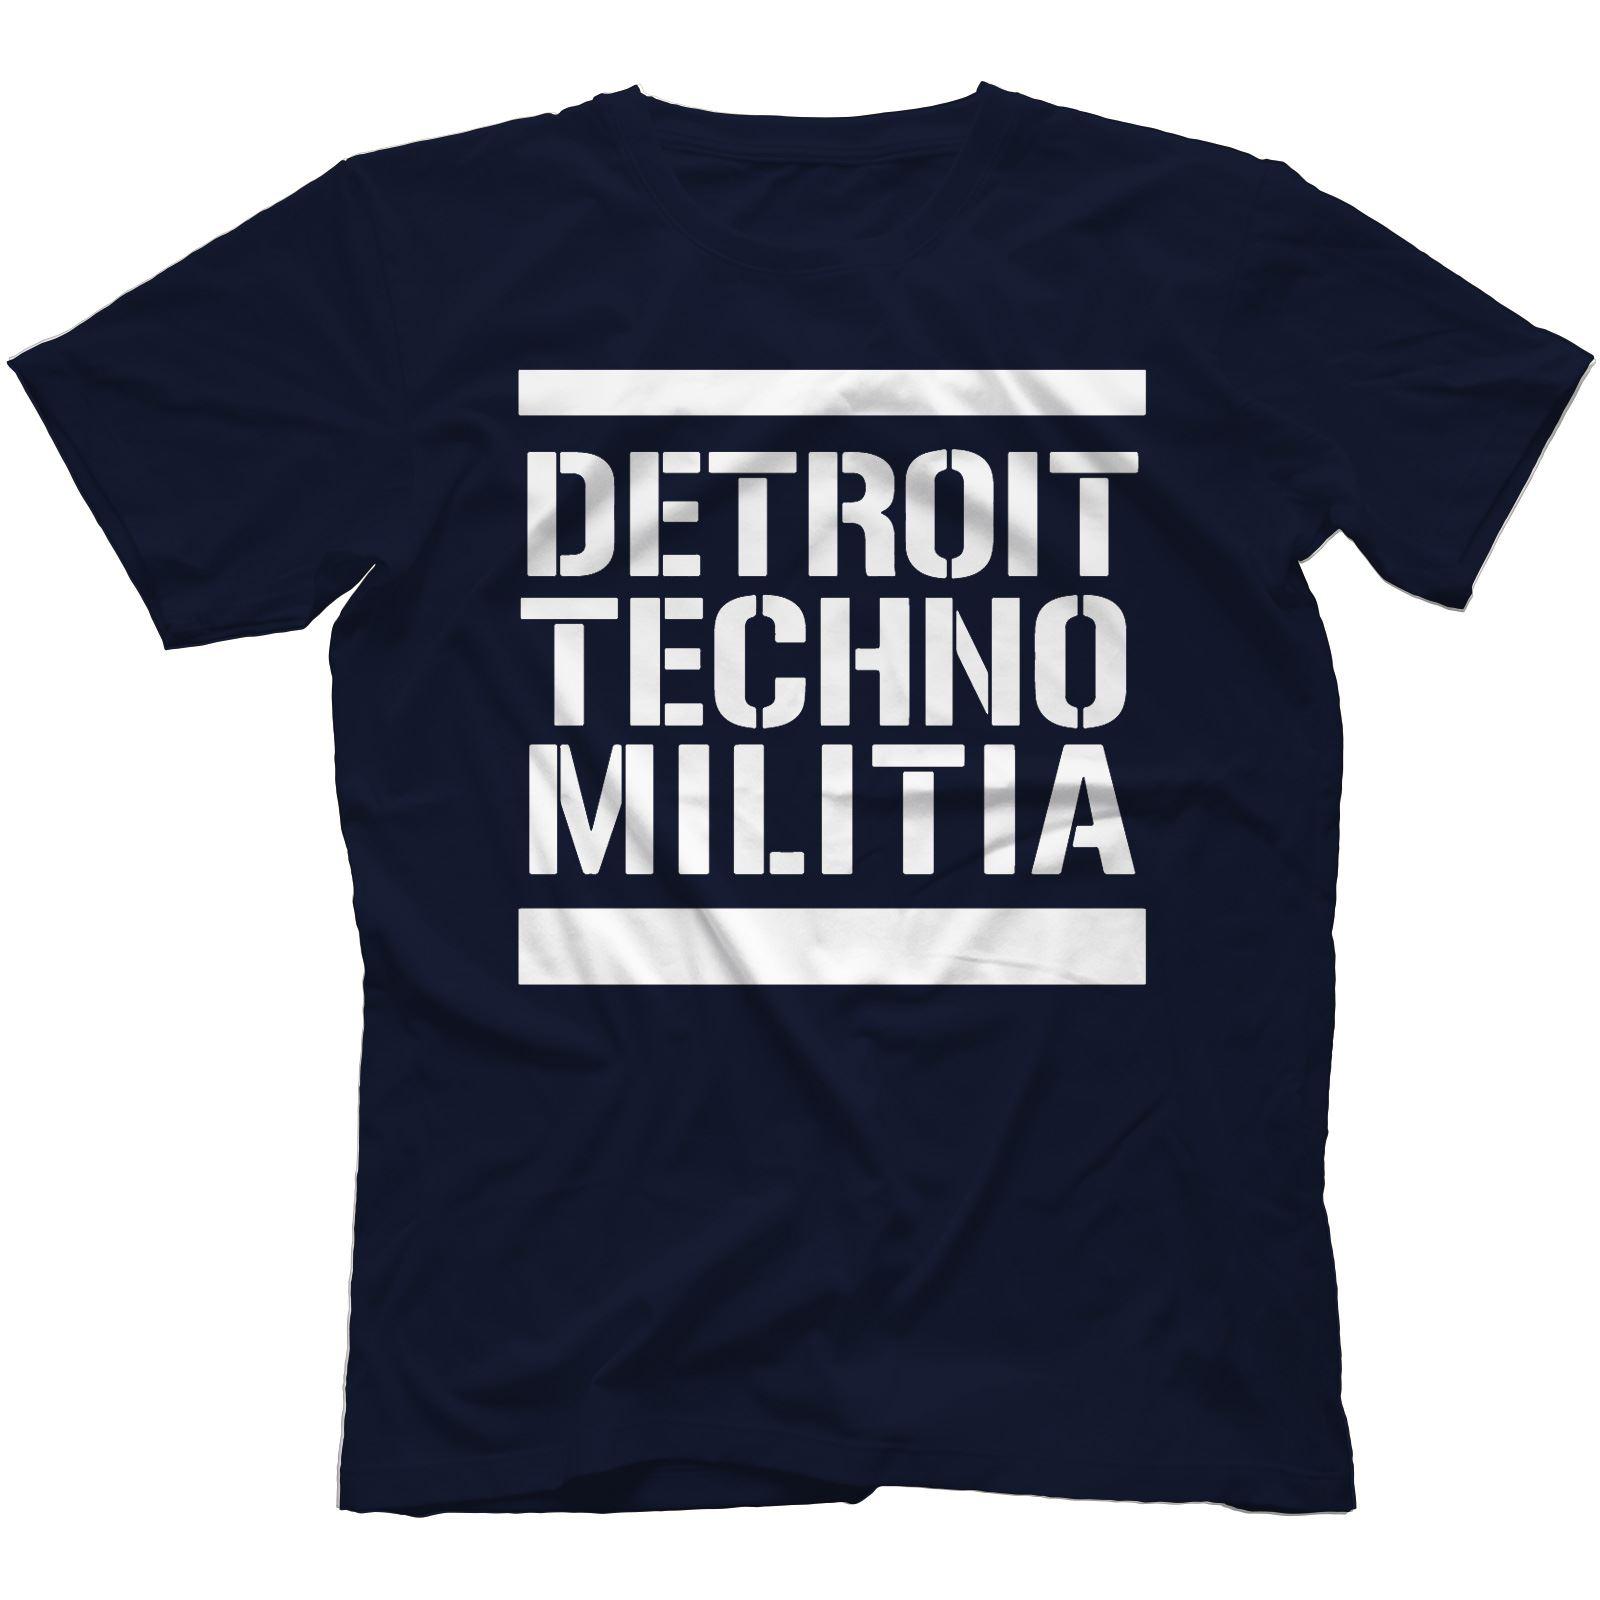 Detroit-Techno-Militia-T-Shirt-100-Cotton-Vinyl-909-Underground-Resistance Indexbild 33